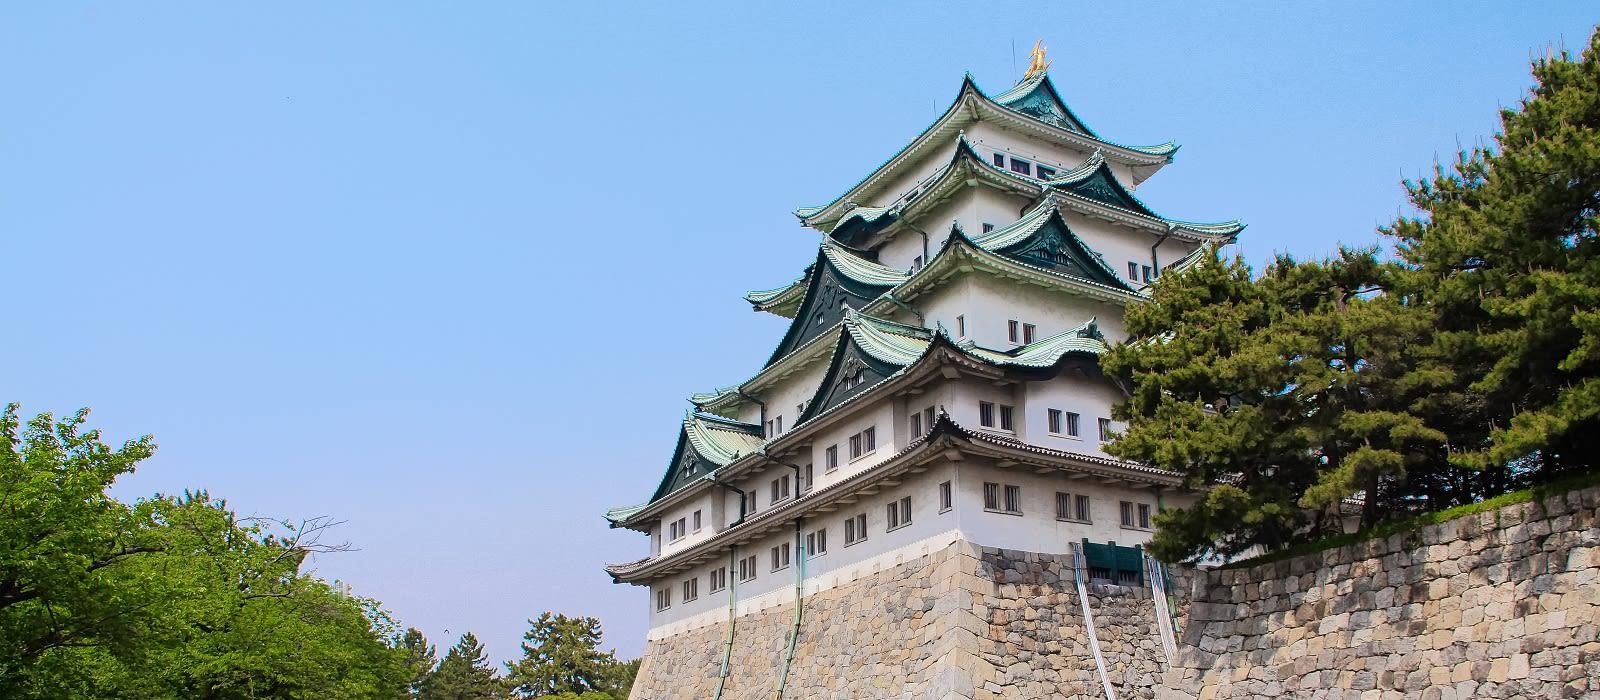 Destination Nagoya Japan